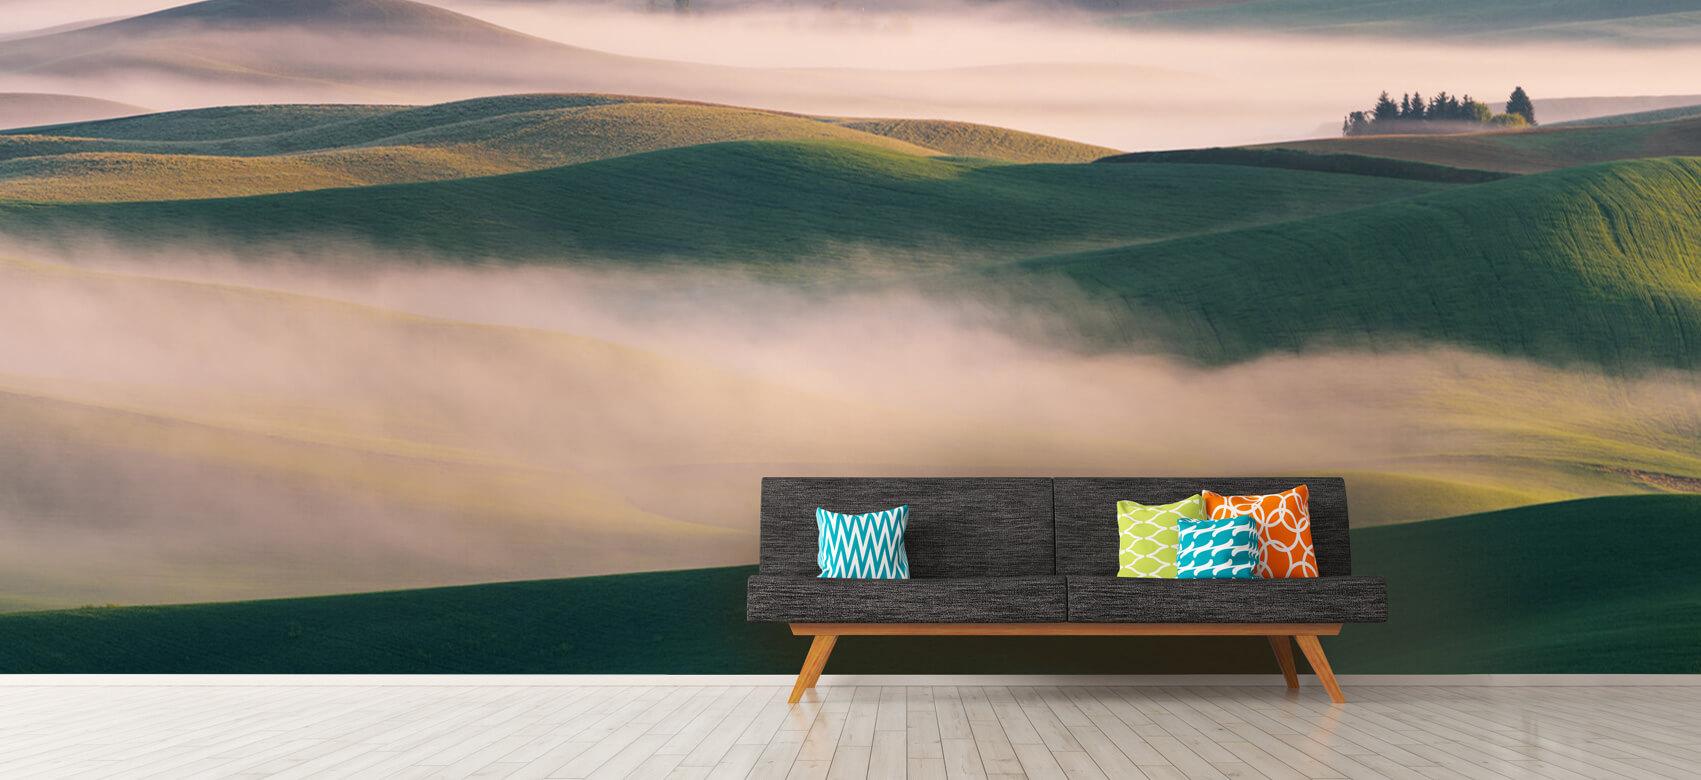 Landschap Dream Land in Morning Mist 12